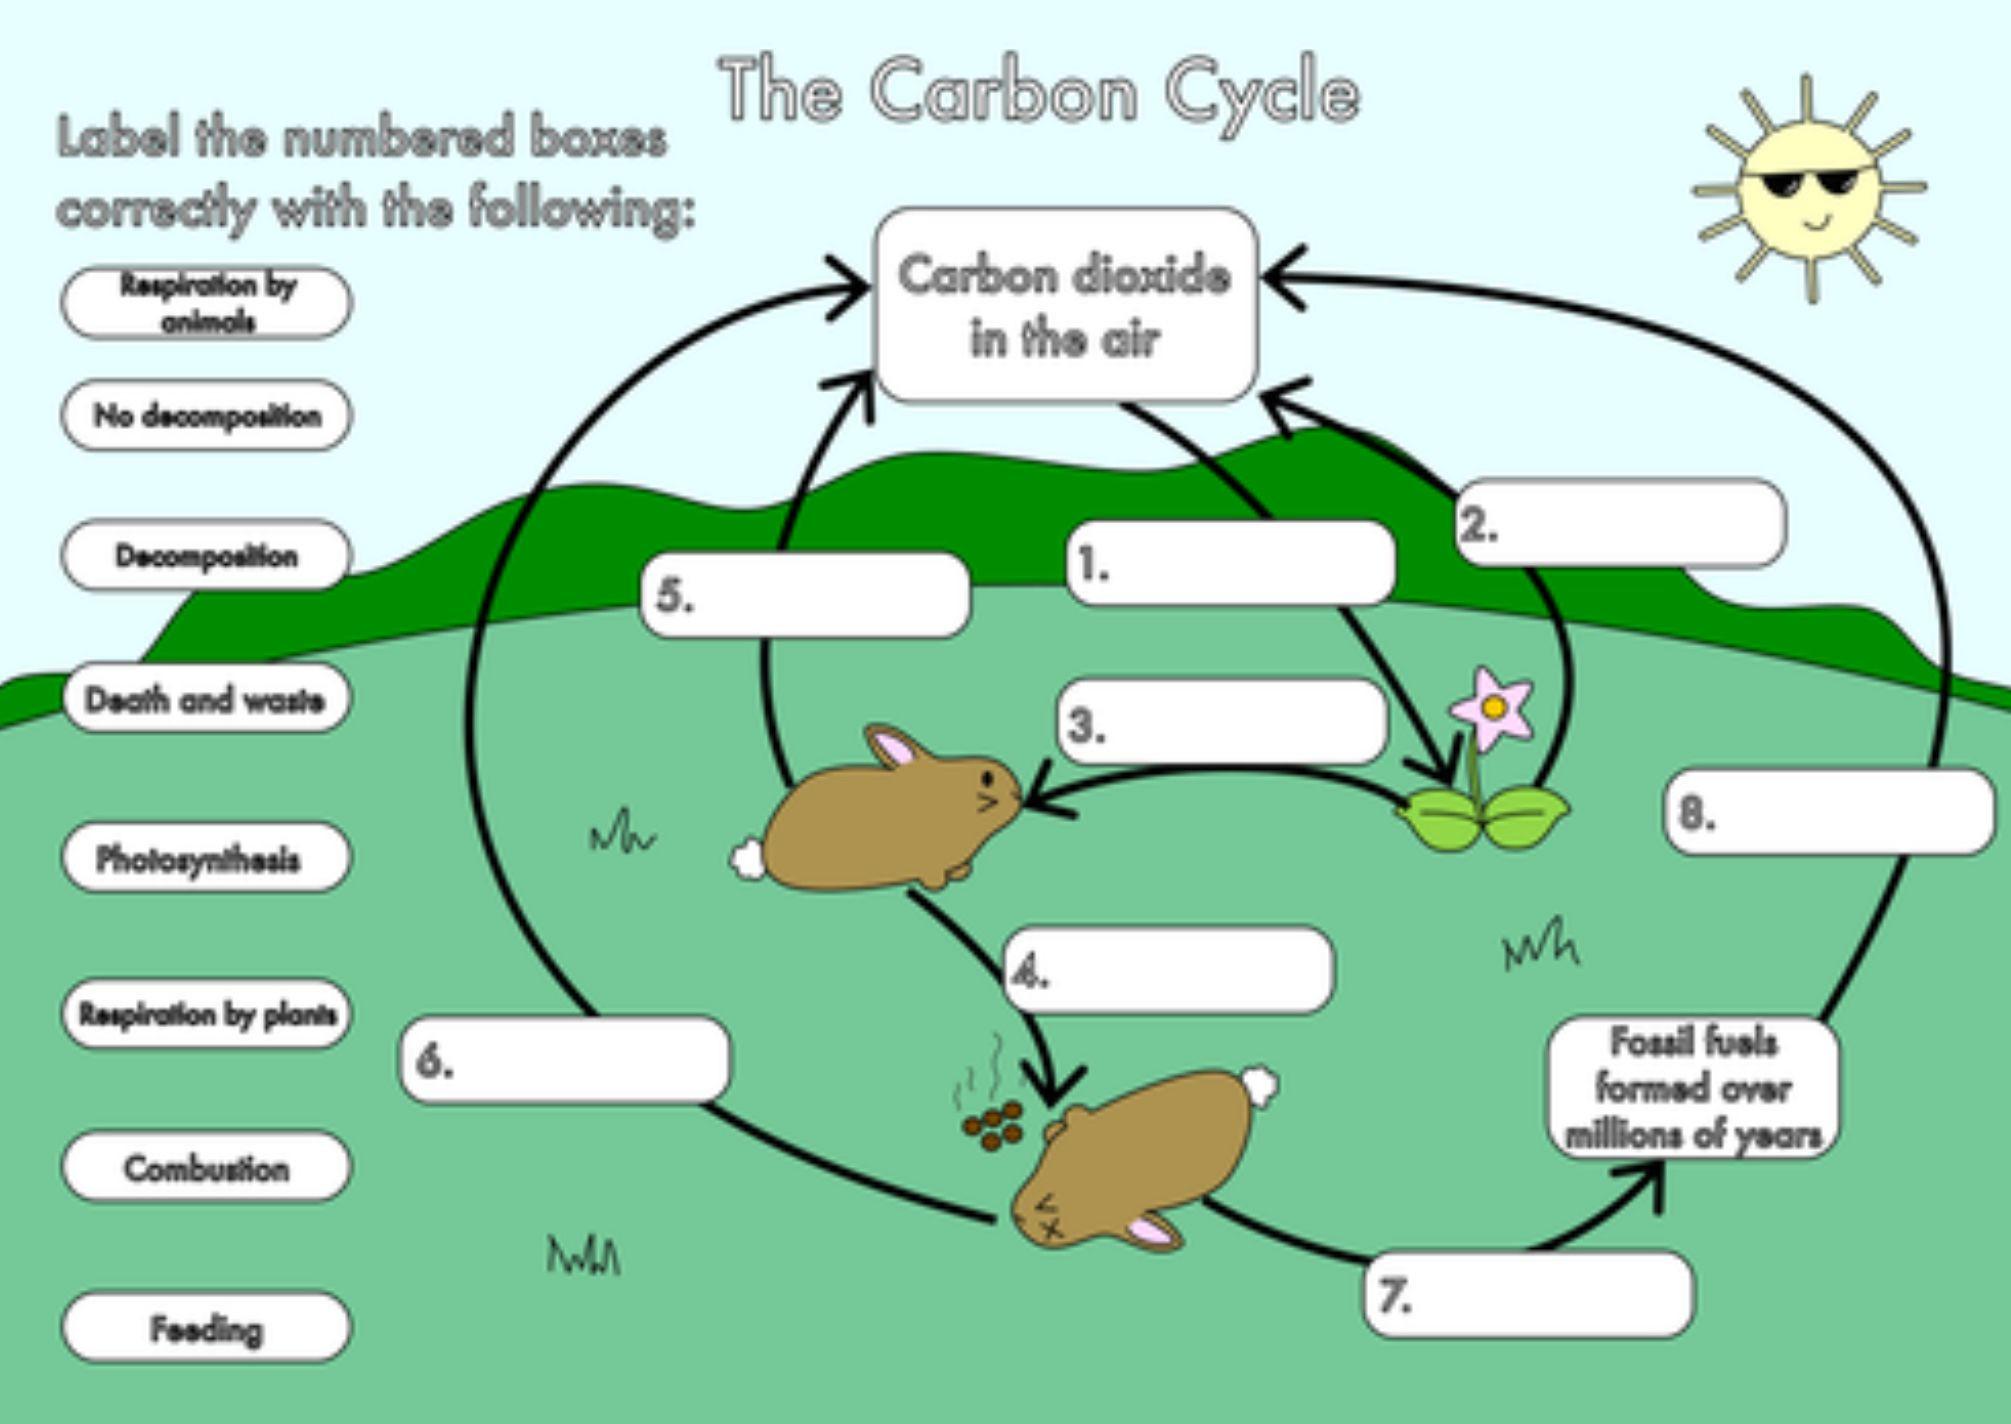 30 Biogeochemical Cycles Worksheet Answers